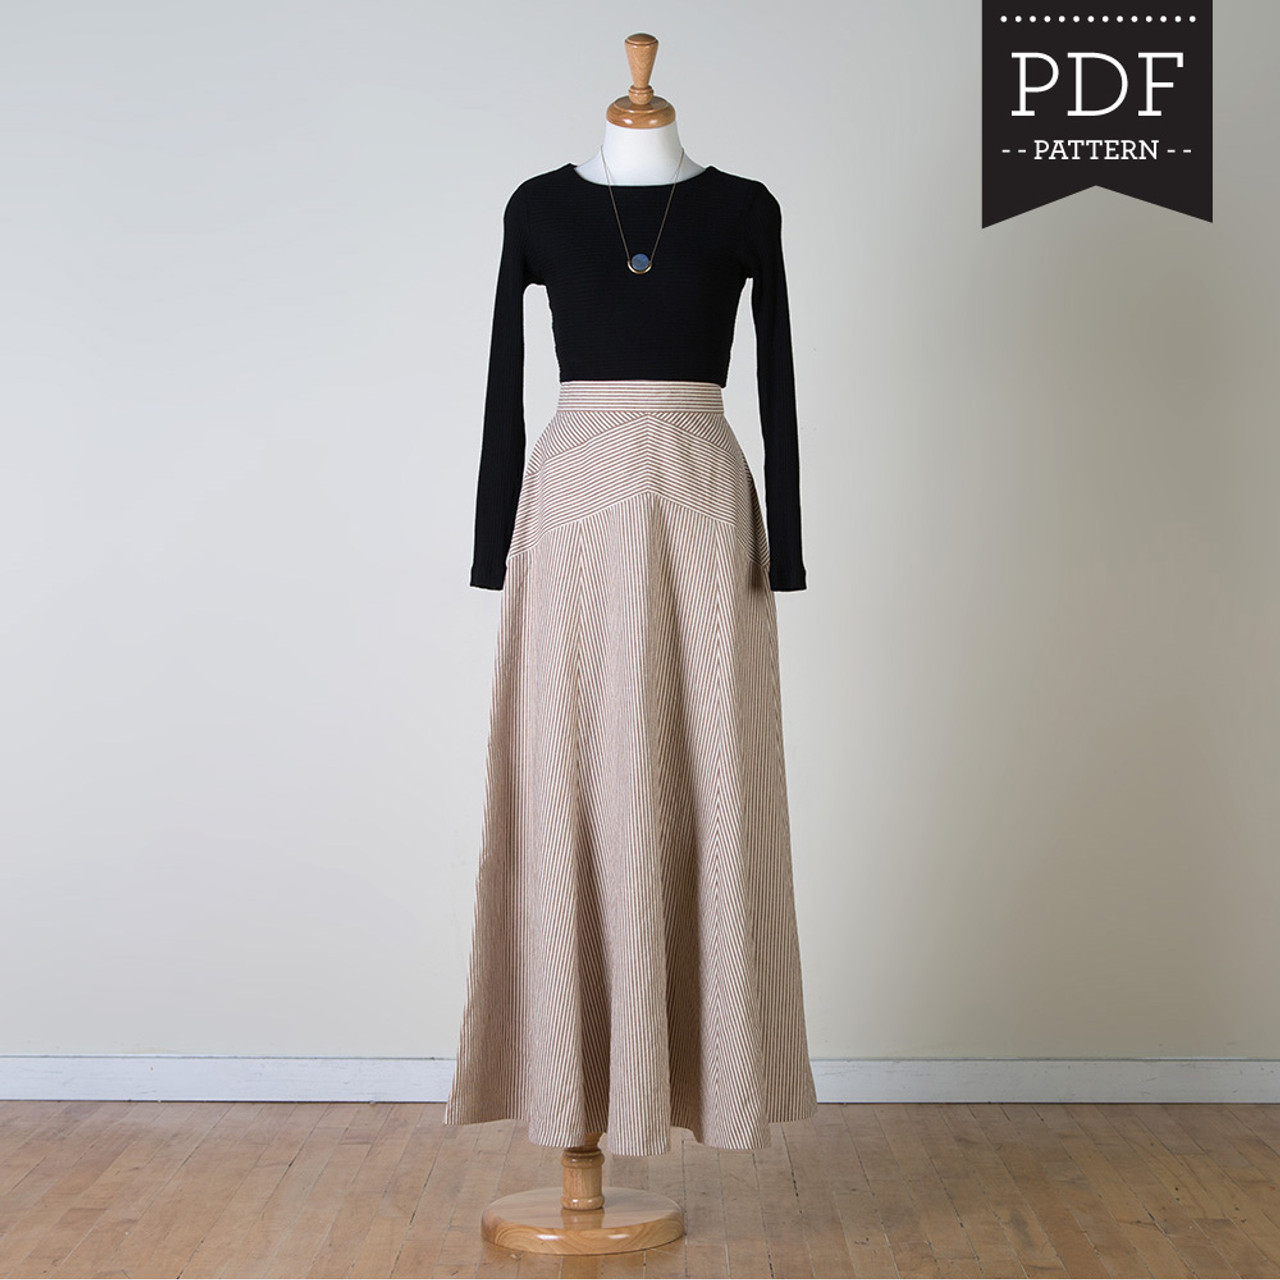 7906fe17dc52 Gabriola skirt sewing pattern by Sewaholic Patterns, gorgeous maxi ...